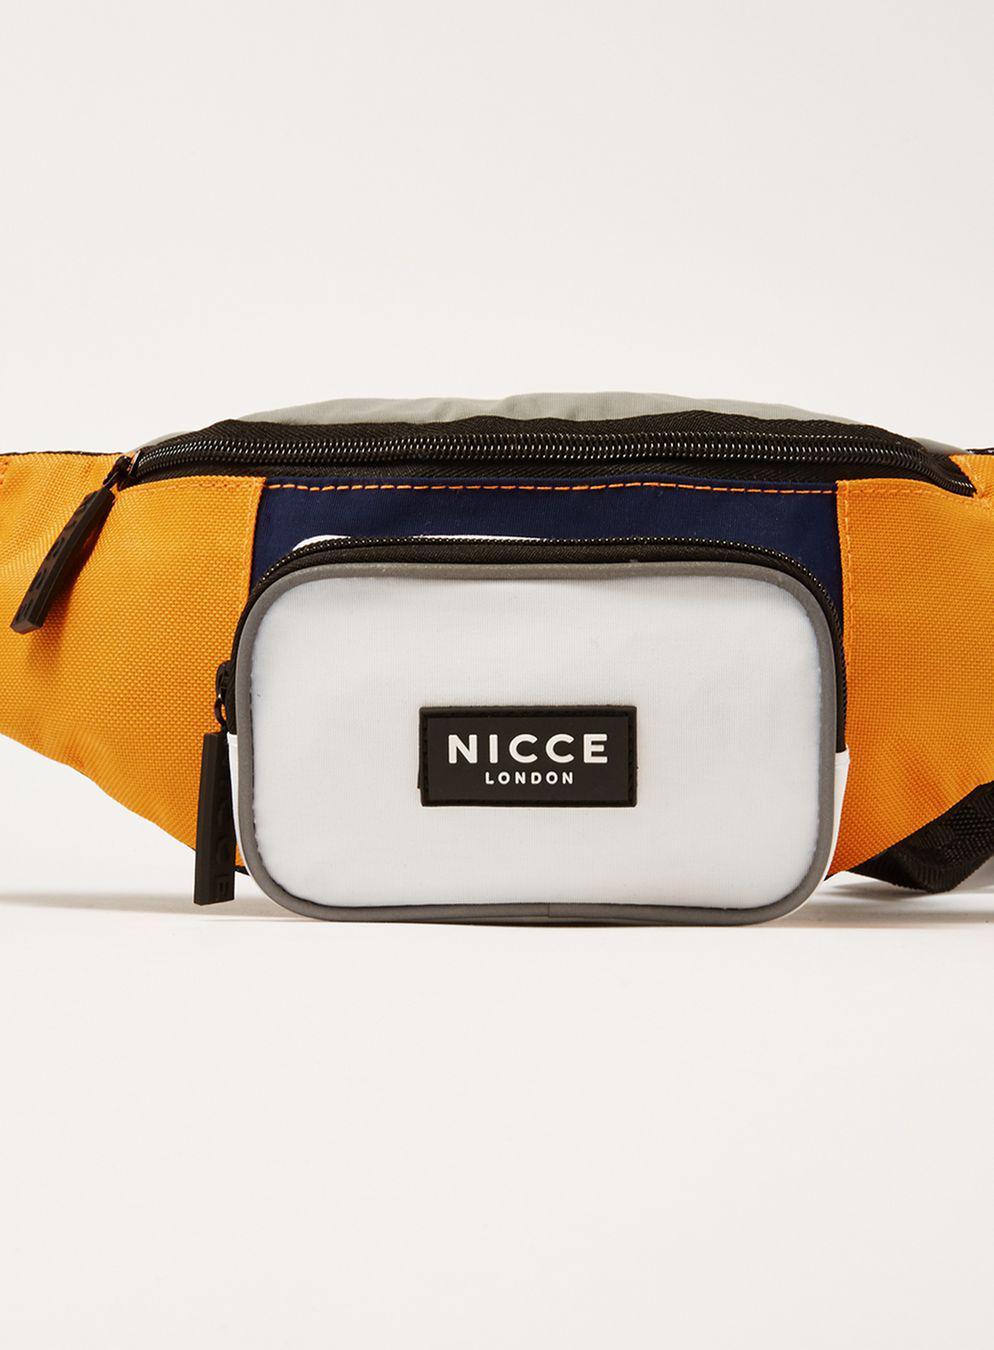 Nicce London Synthetic Orange Cross Body Bag in Black for Men